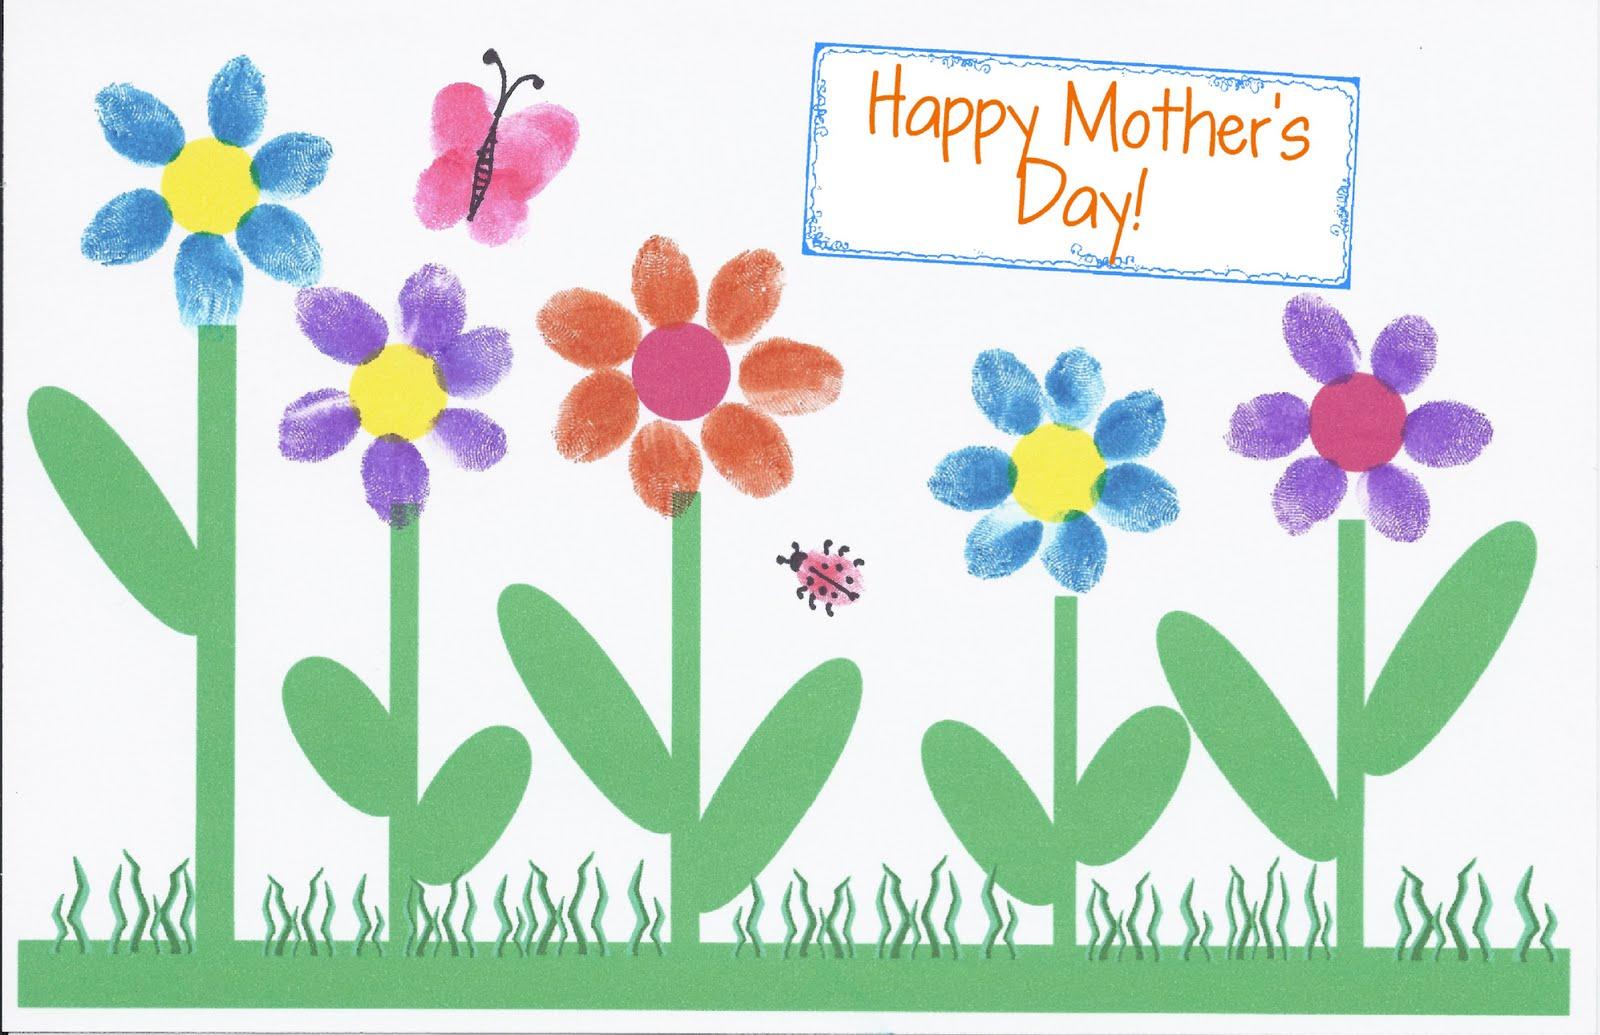 Mothers day mother clipart 8-Mothers day mother clipart 8-14